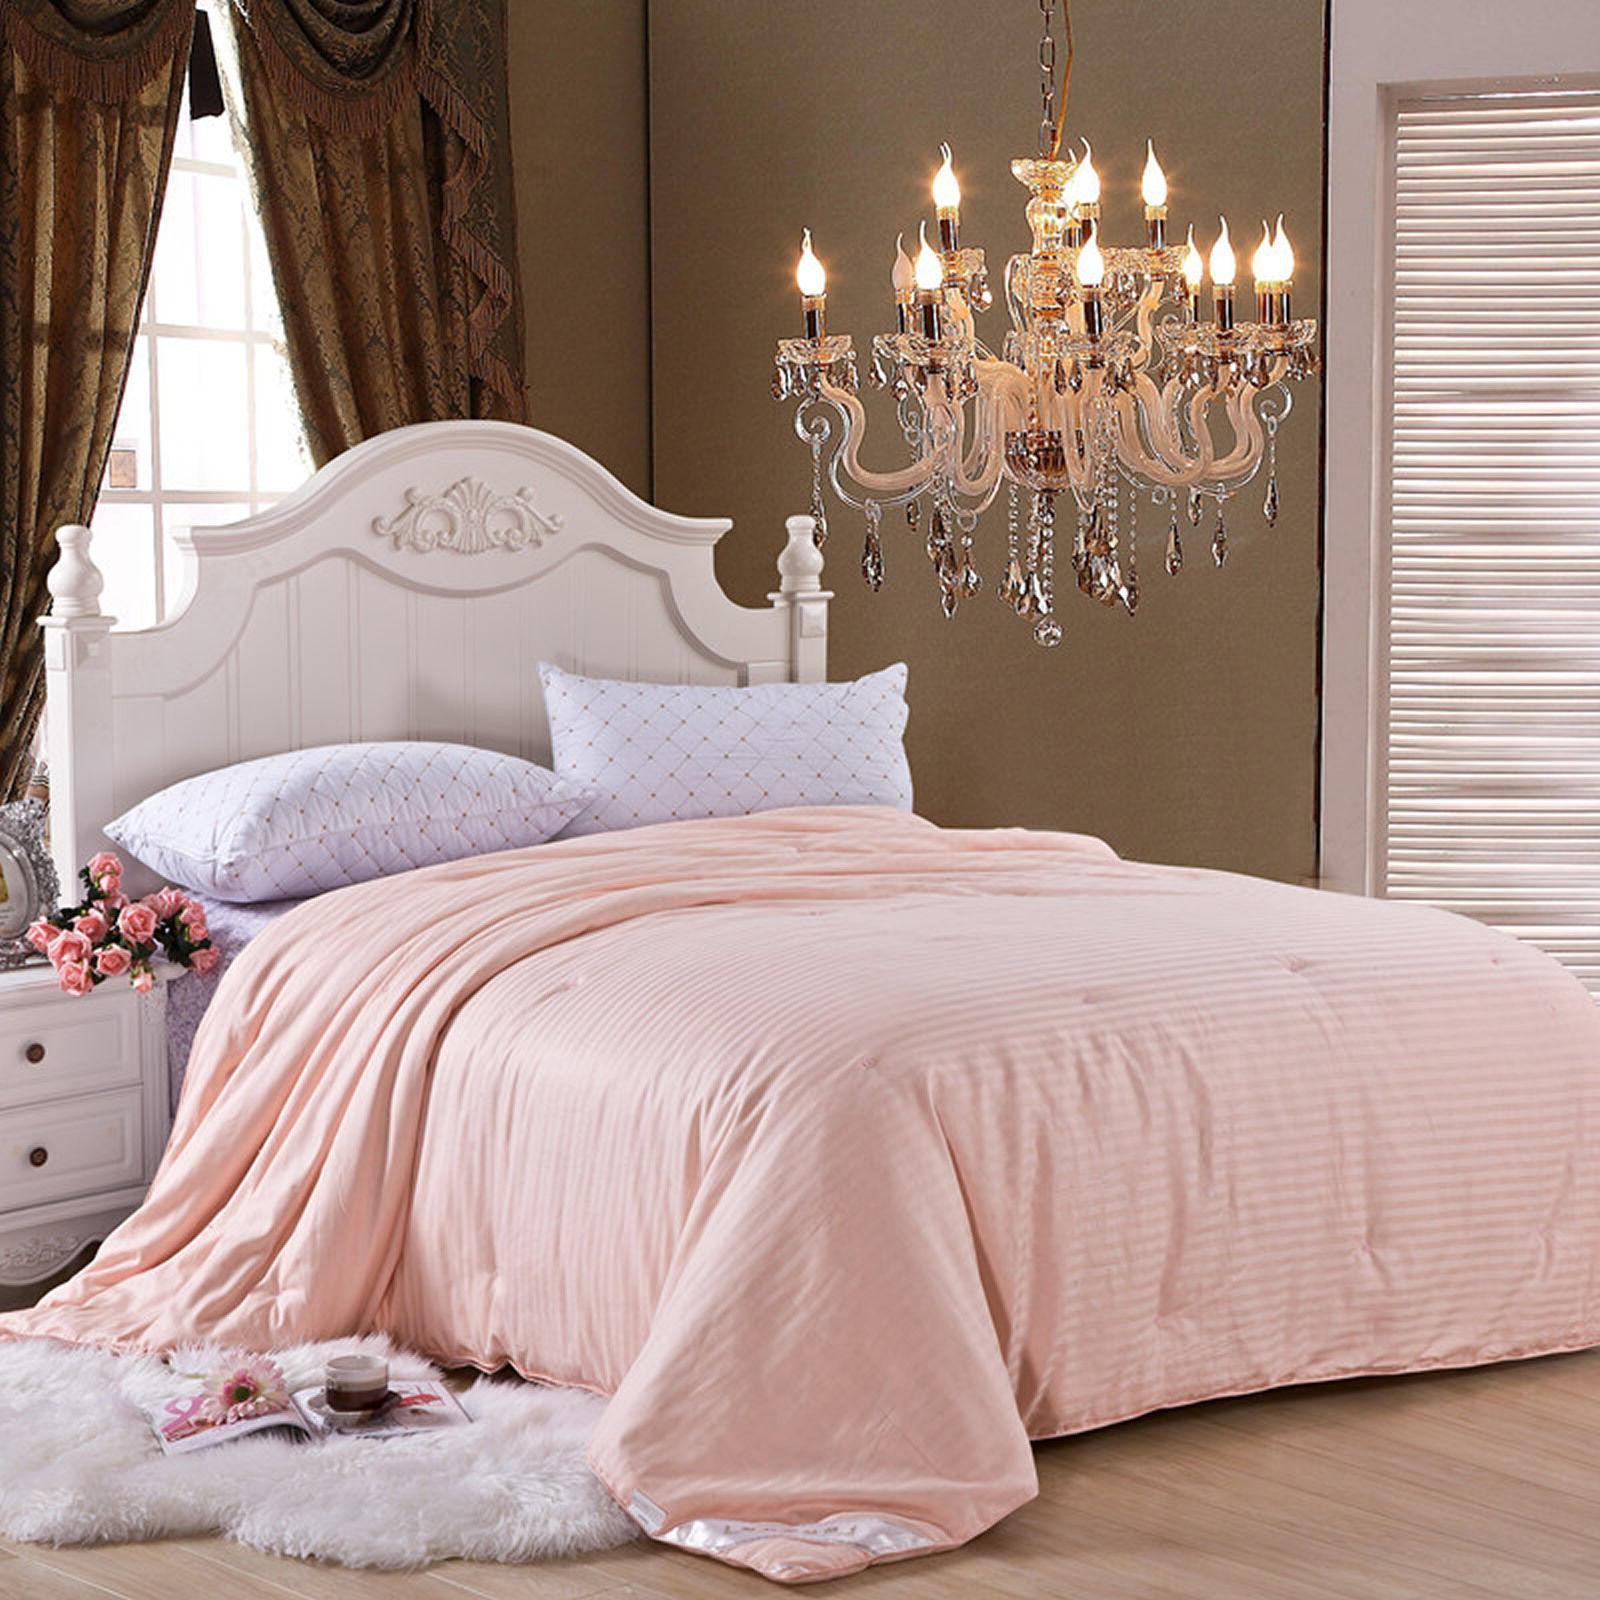 high quality 100 percent silk filled comforter